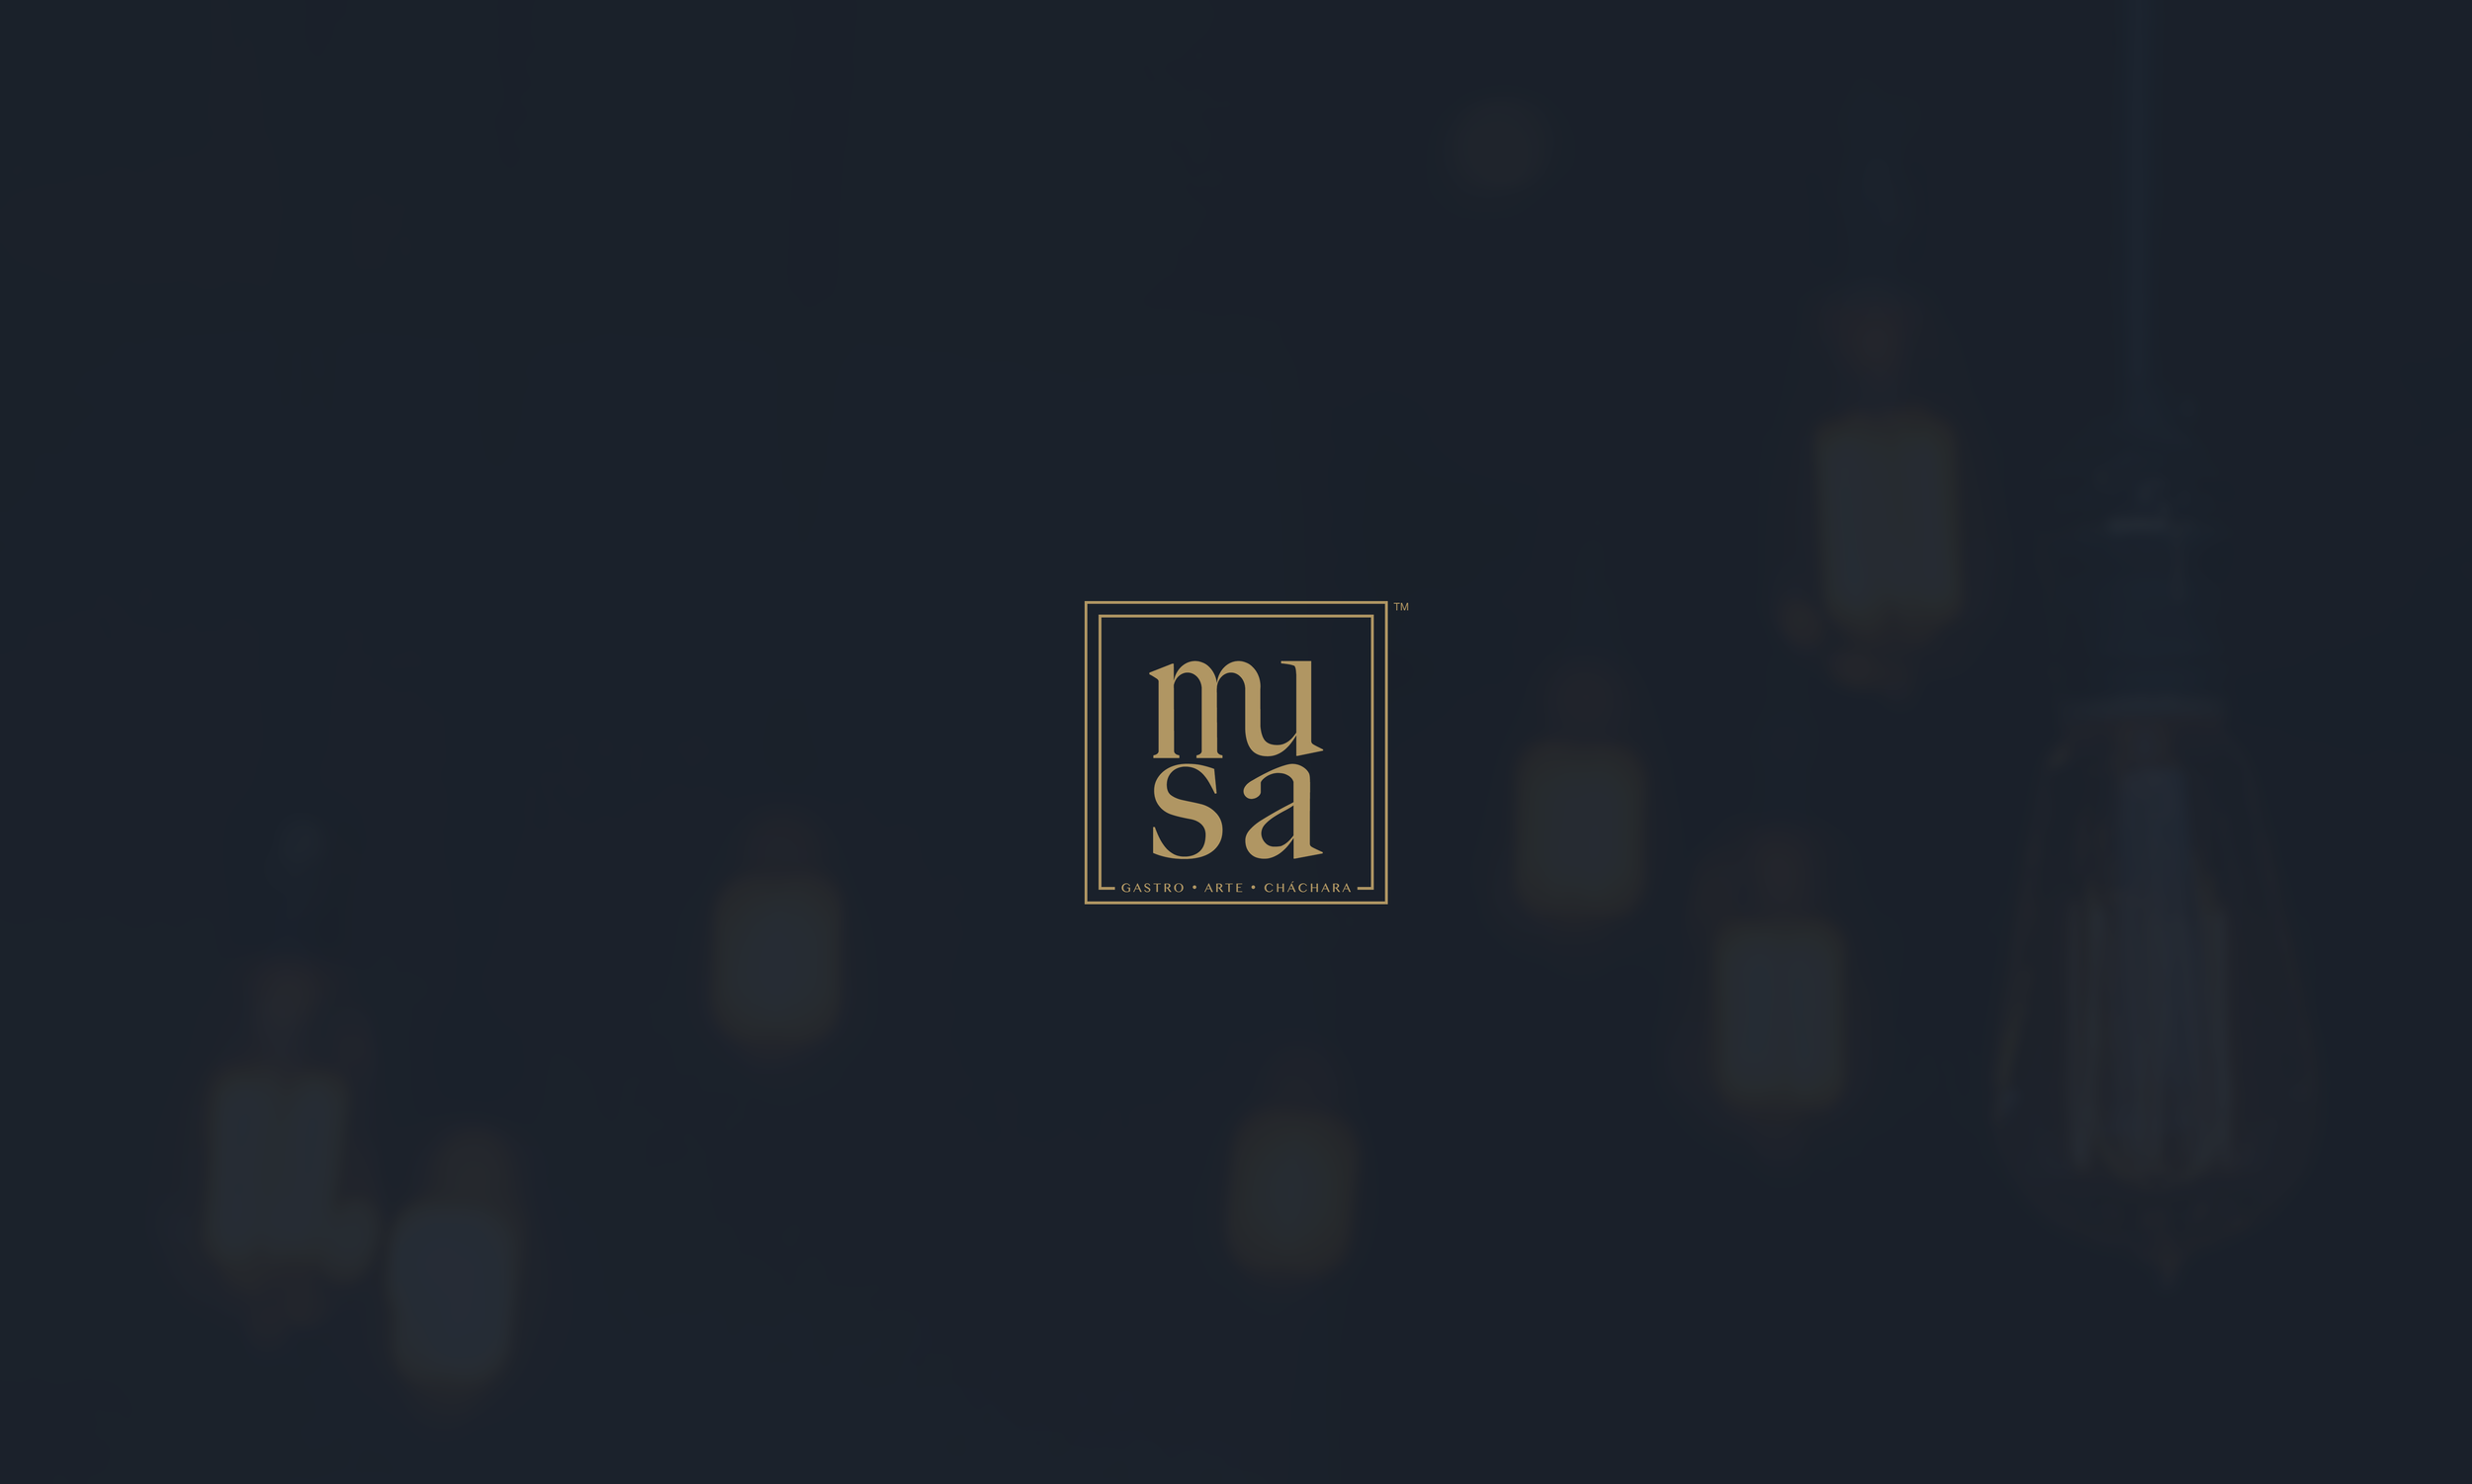 musa-2.png